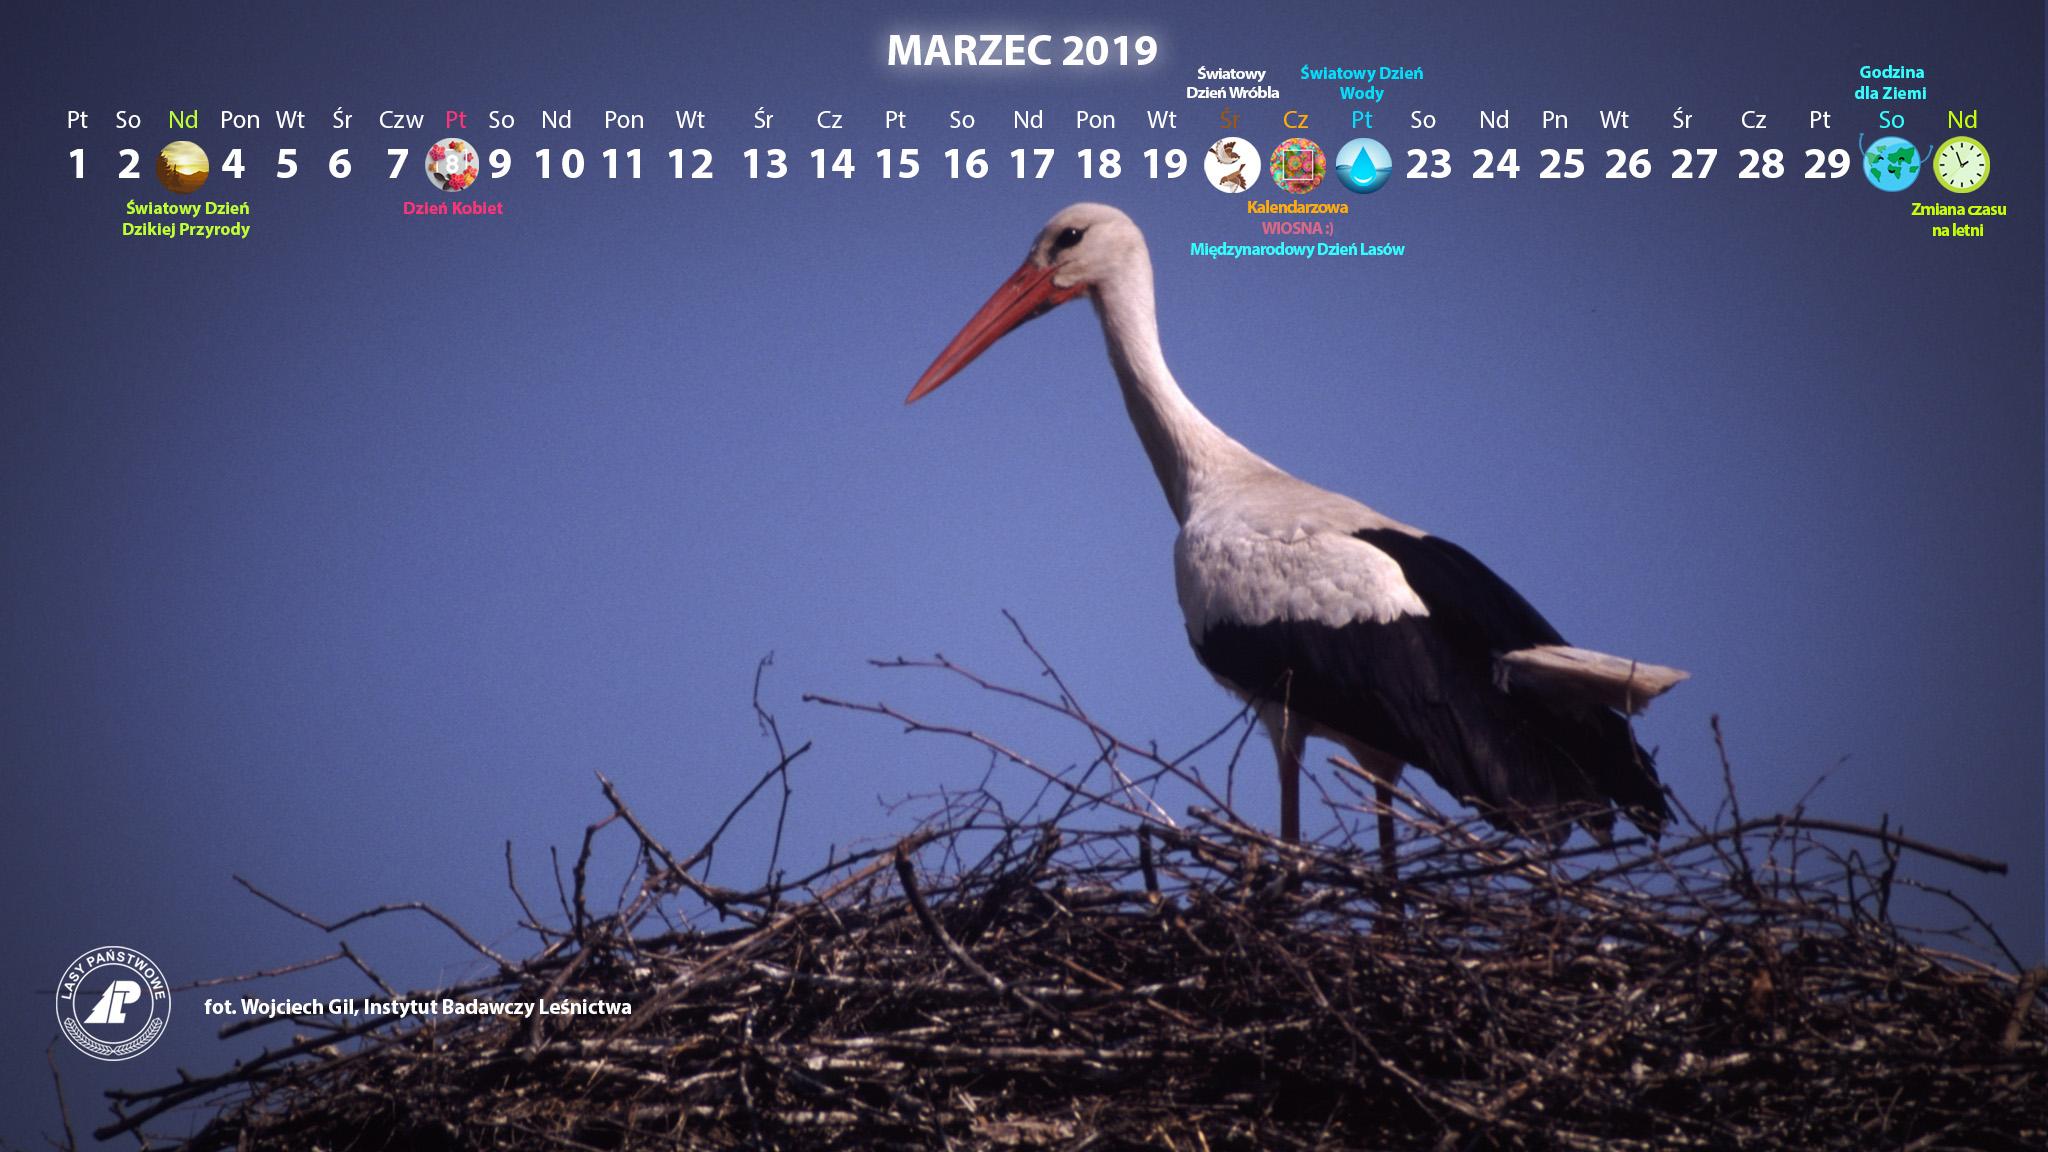 Kalendarz_marzec_2019_2048x1152[1].jpg